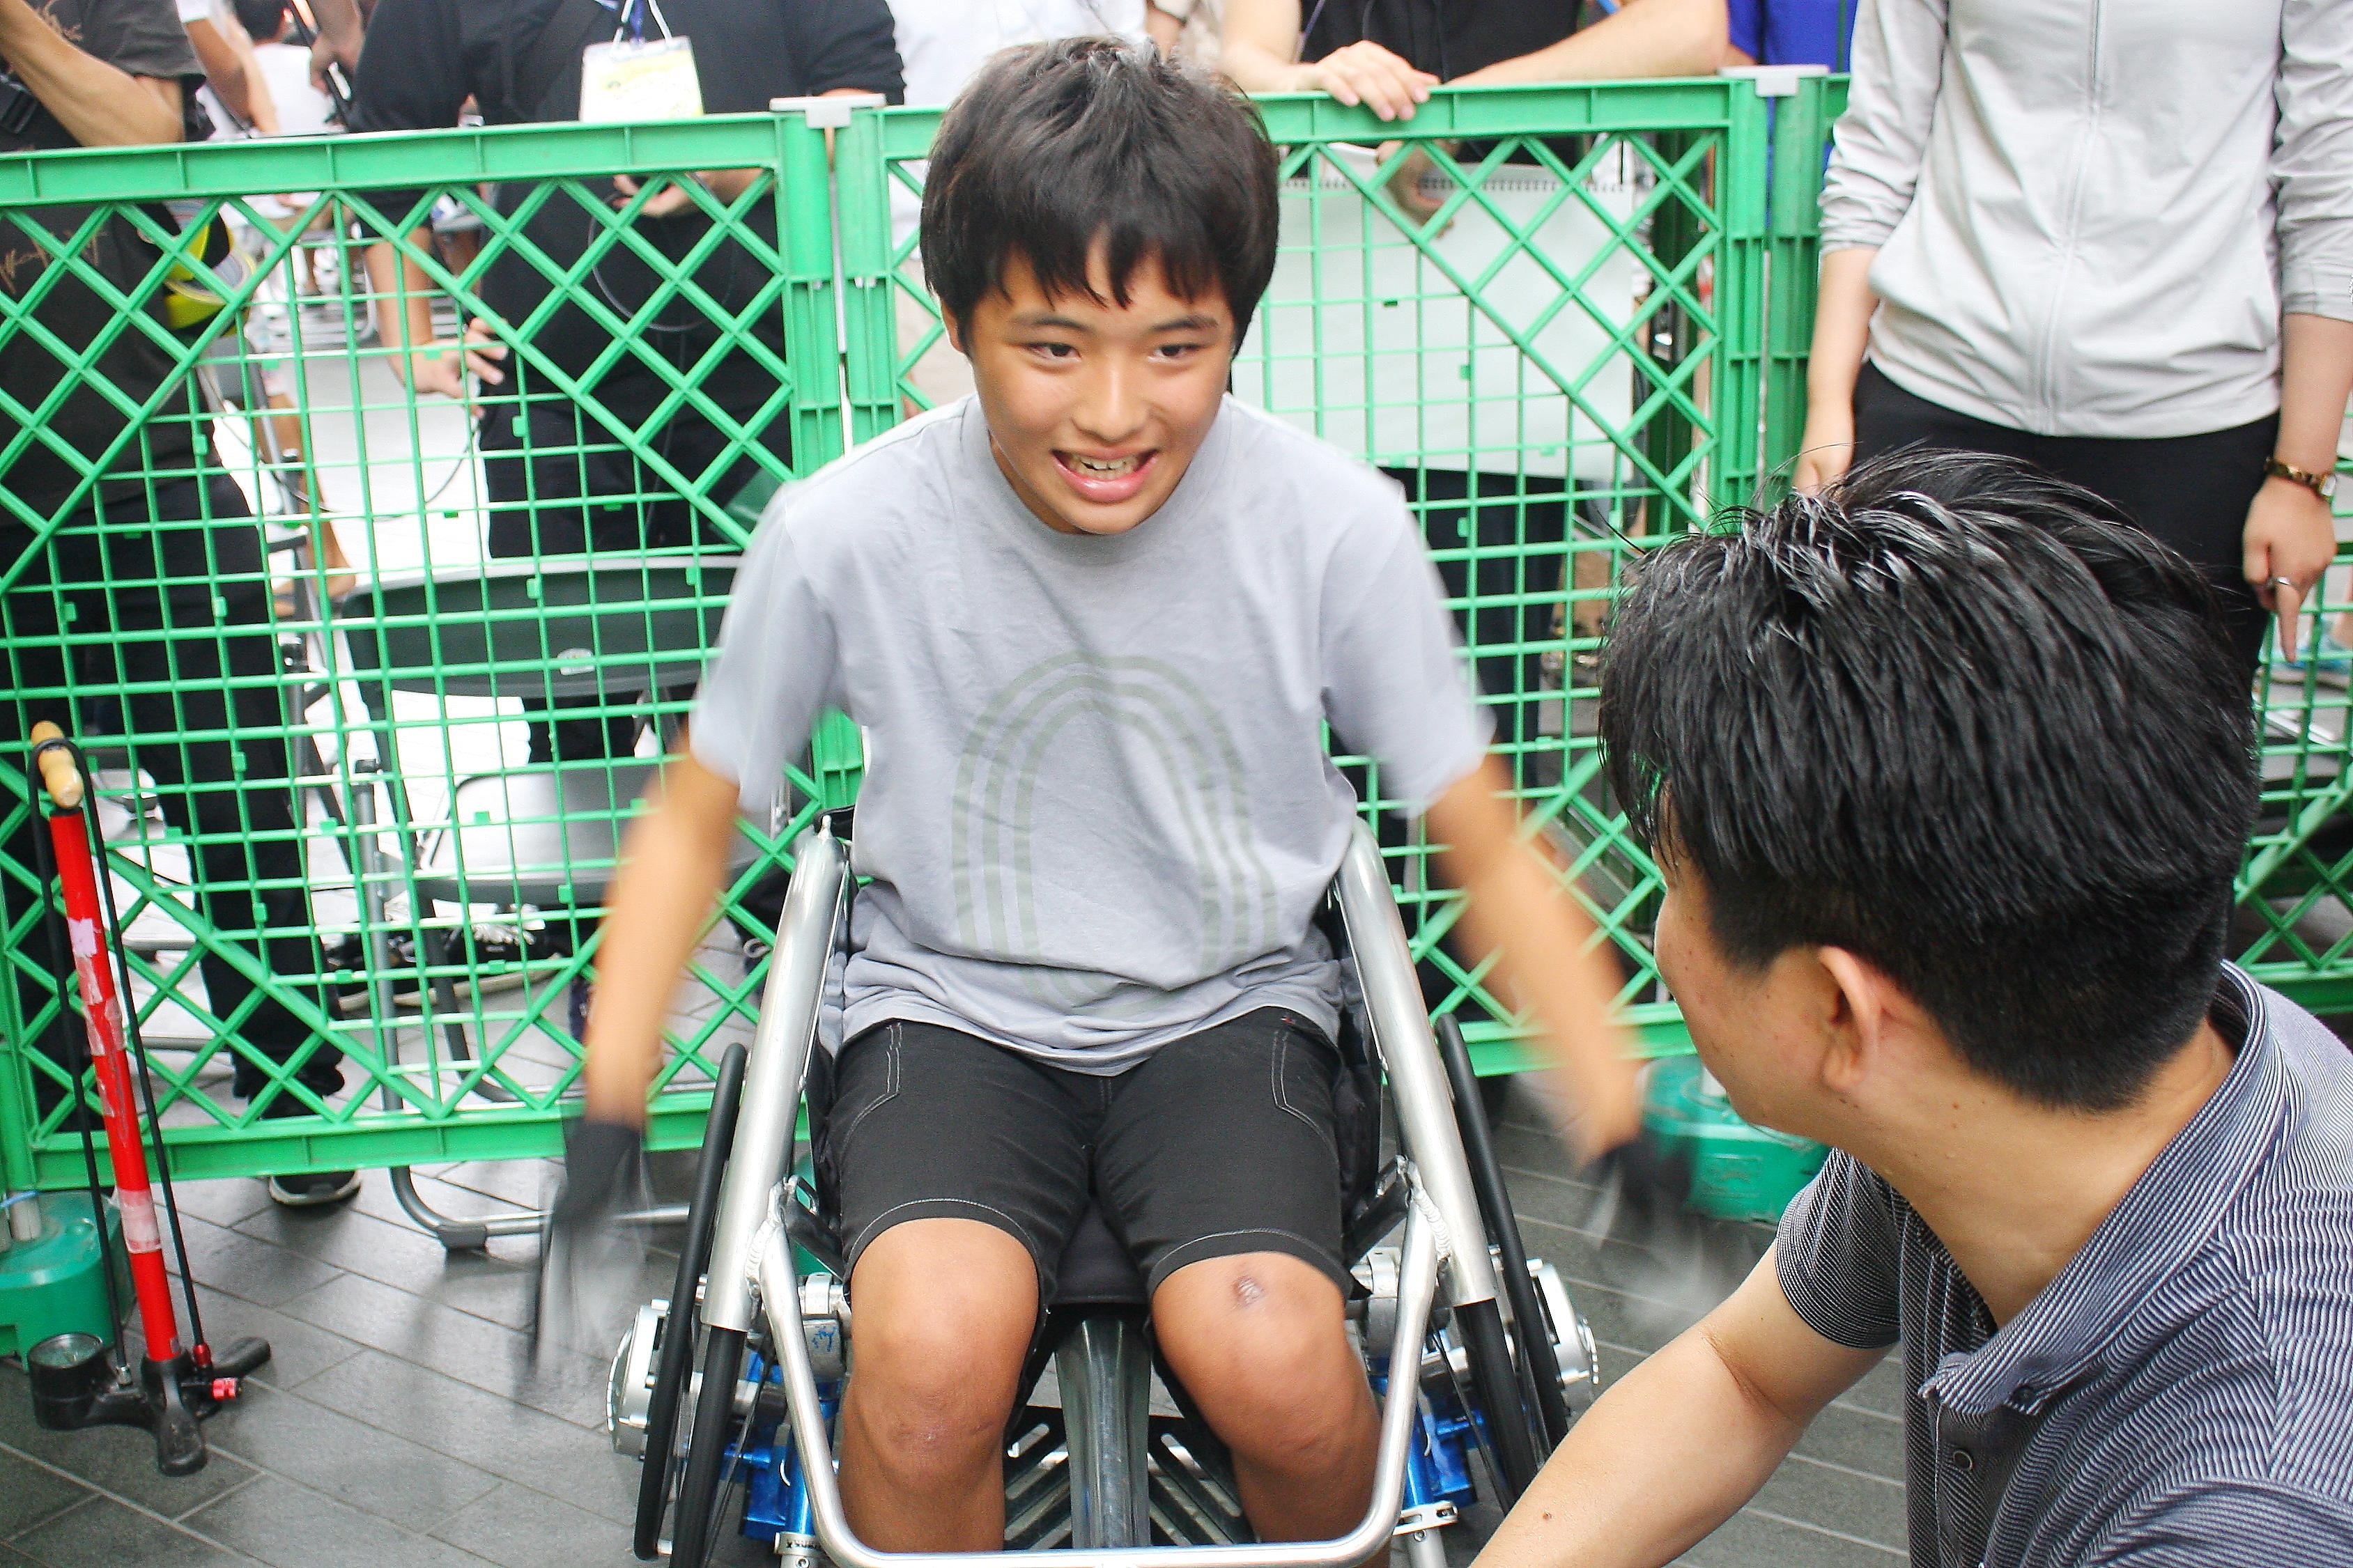 http://news.yoshimoto.co.jp/20180730144349-fa1ecc8110f26ecb28609bf4948b10a9e1f705df.jpg